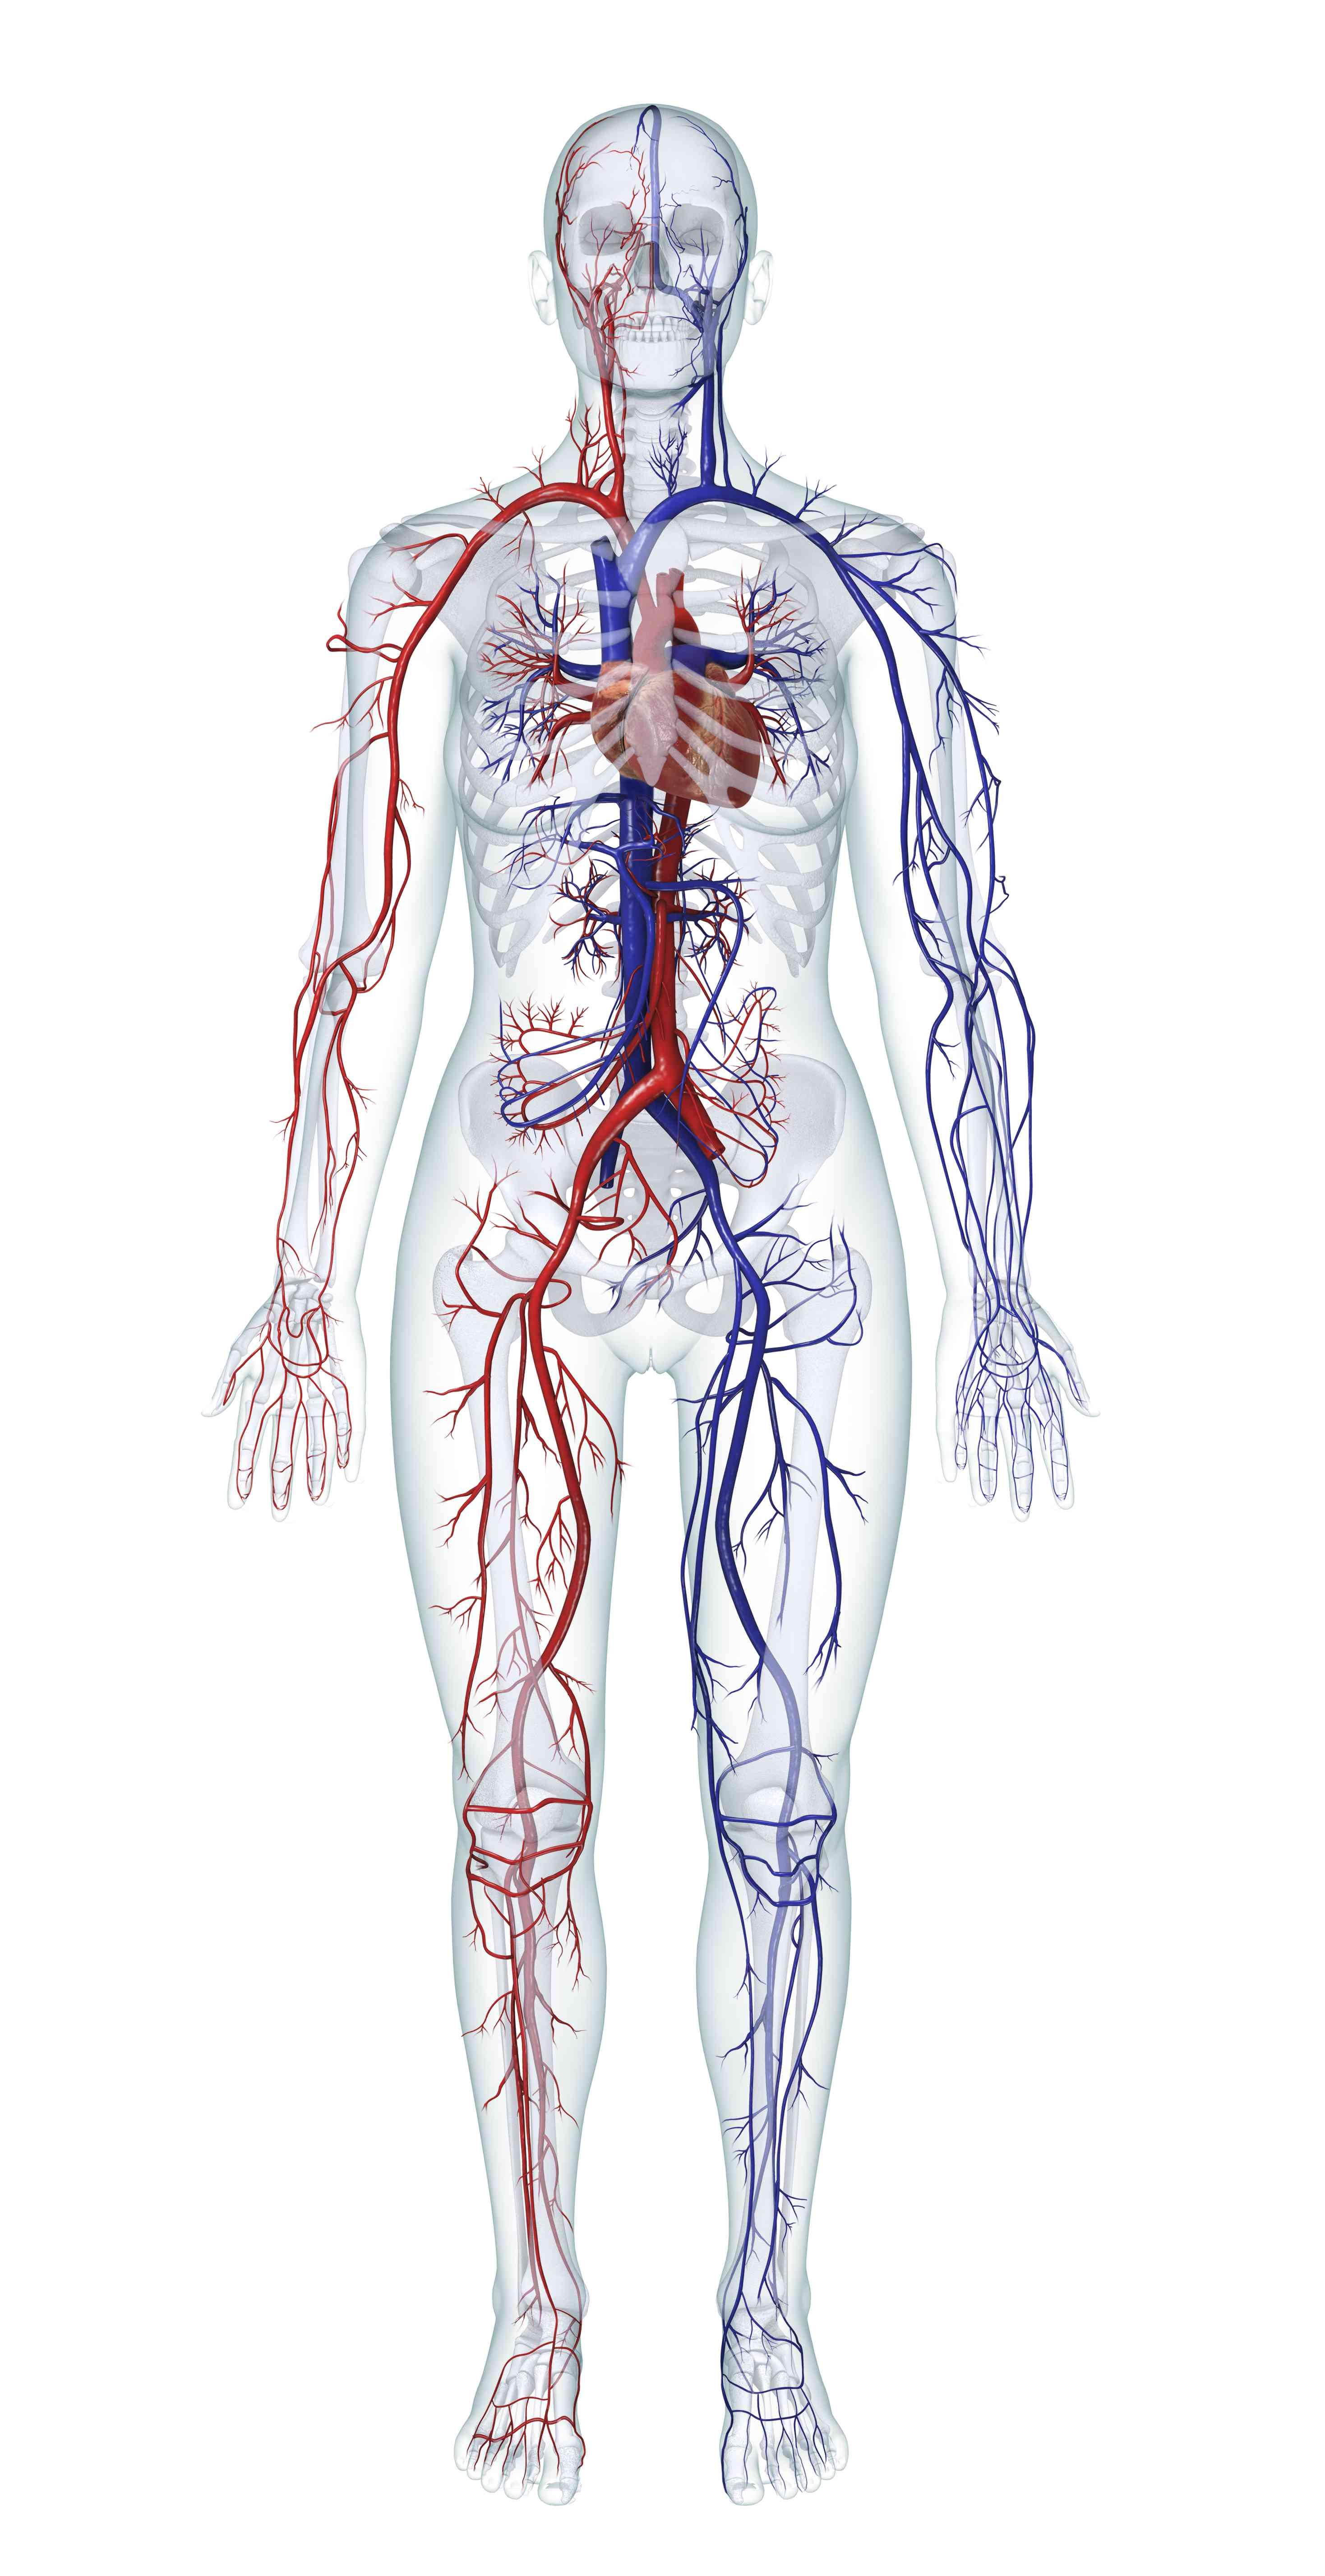 Digital illustration of the human cardiovascular system (female)